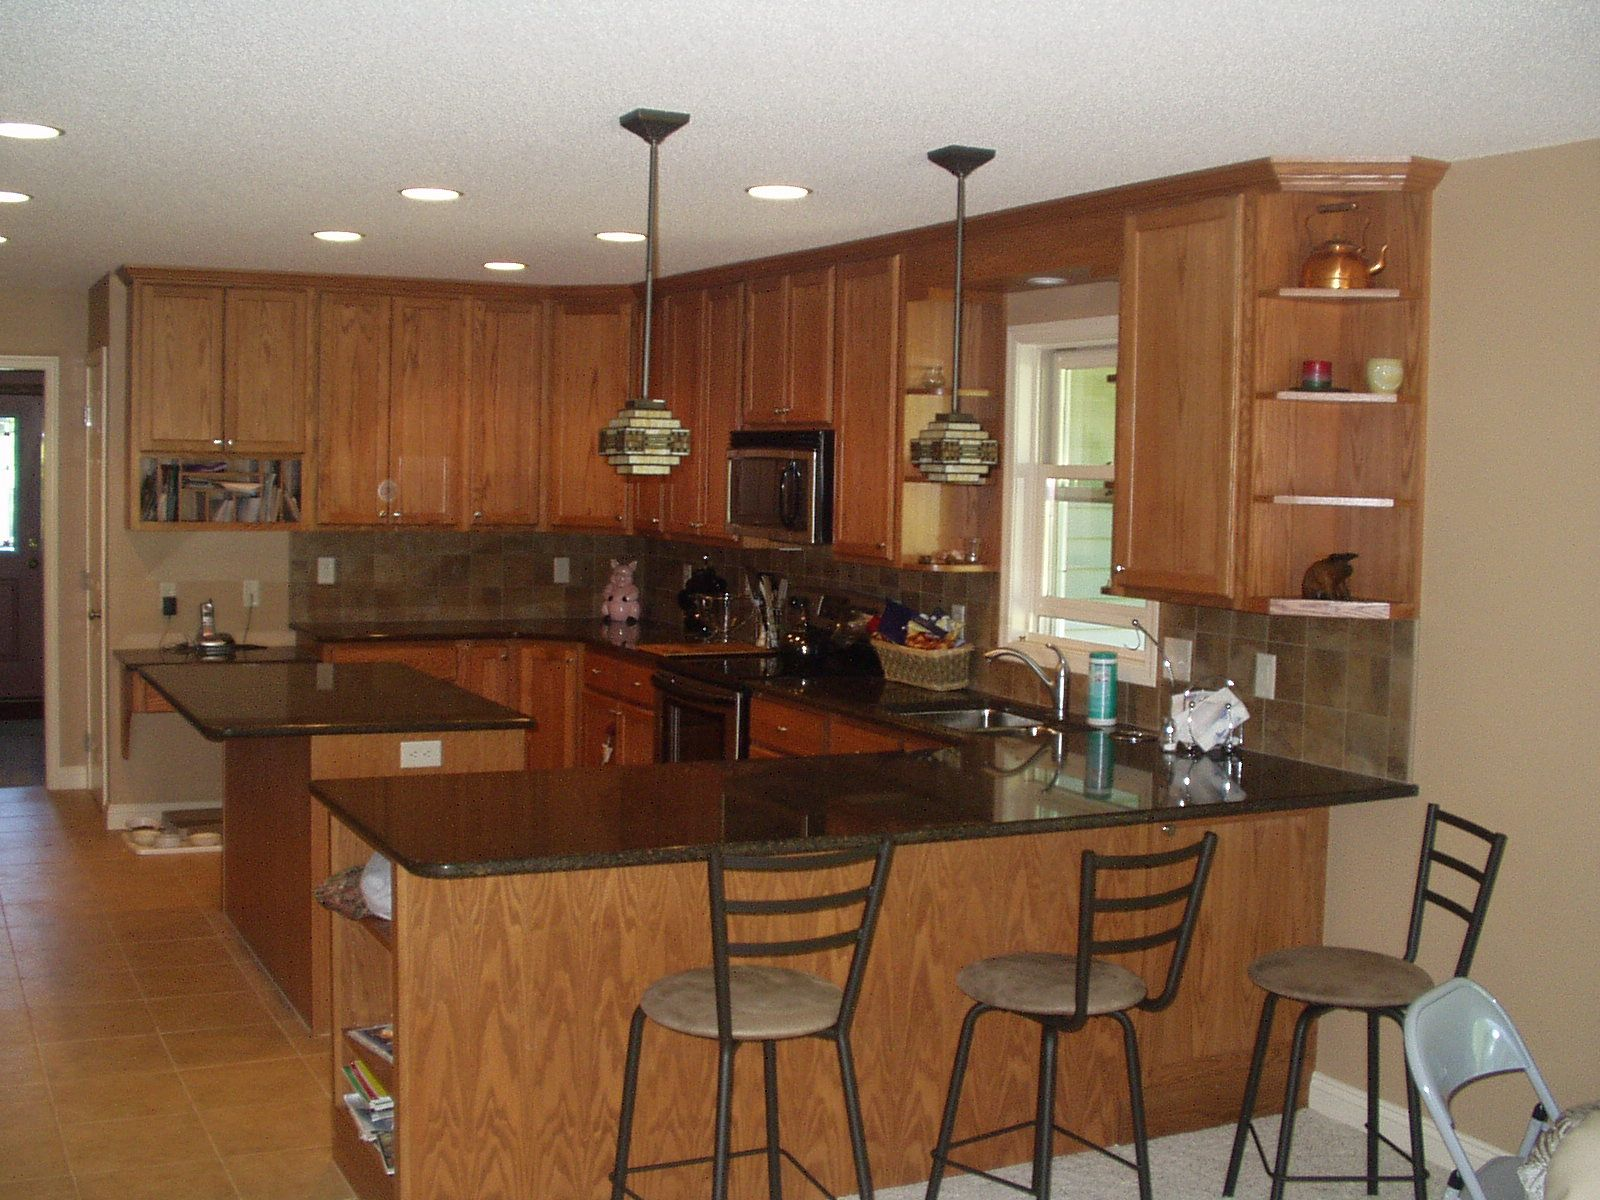 u shape kitchens kitchen complete kitchen remodel home kitchens kitchen remodel pictures on kitchen ideas u shaped id=78468